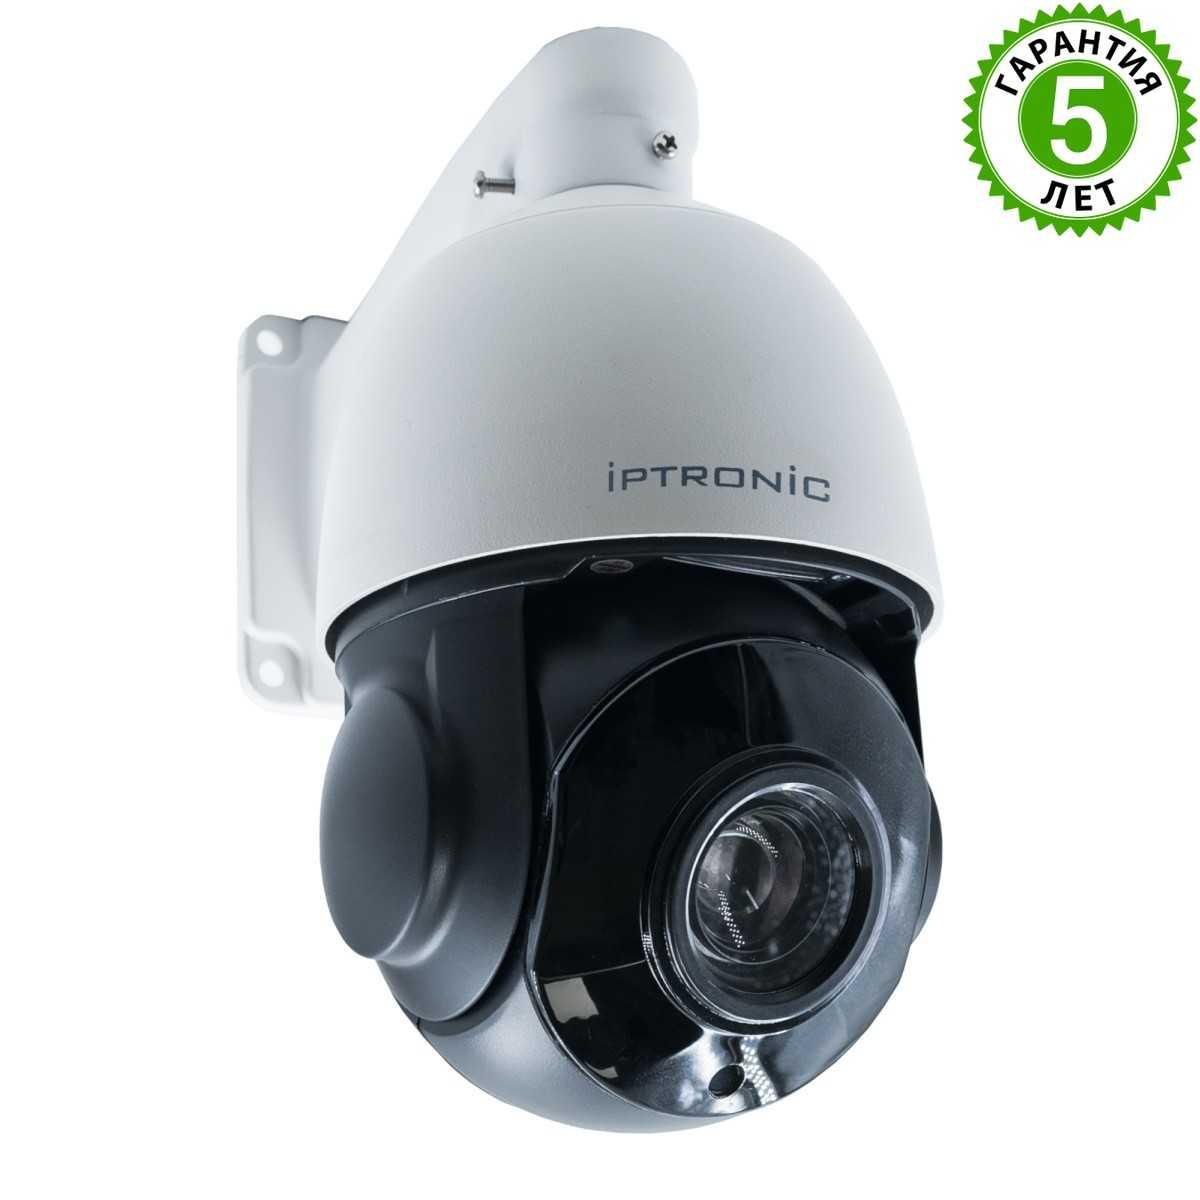 Видеокамера IPTRONIC IP5MS200(22X)IR60